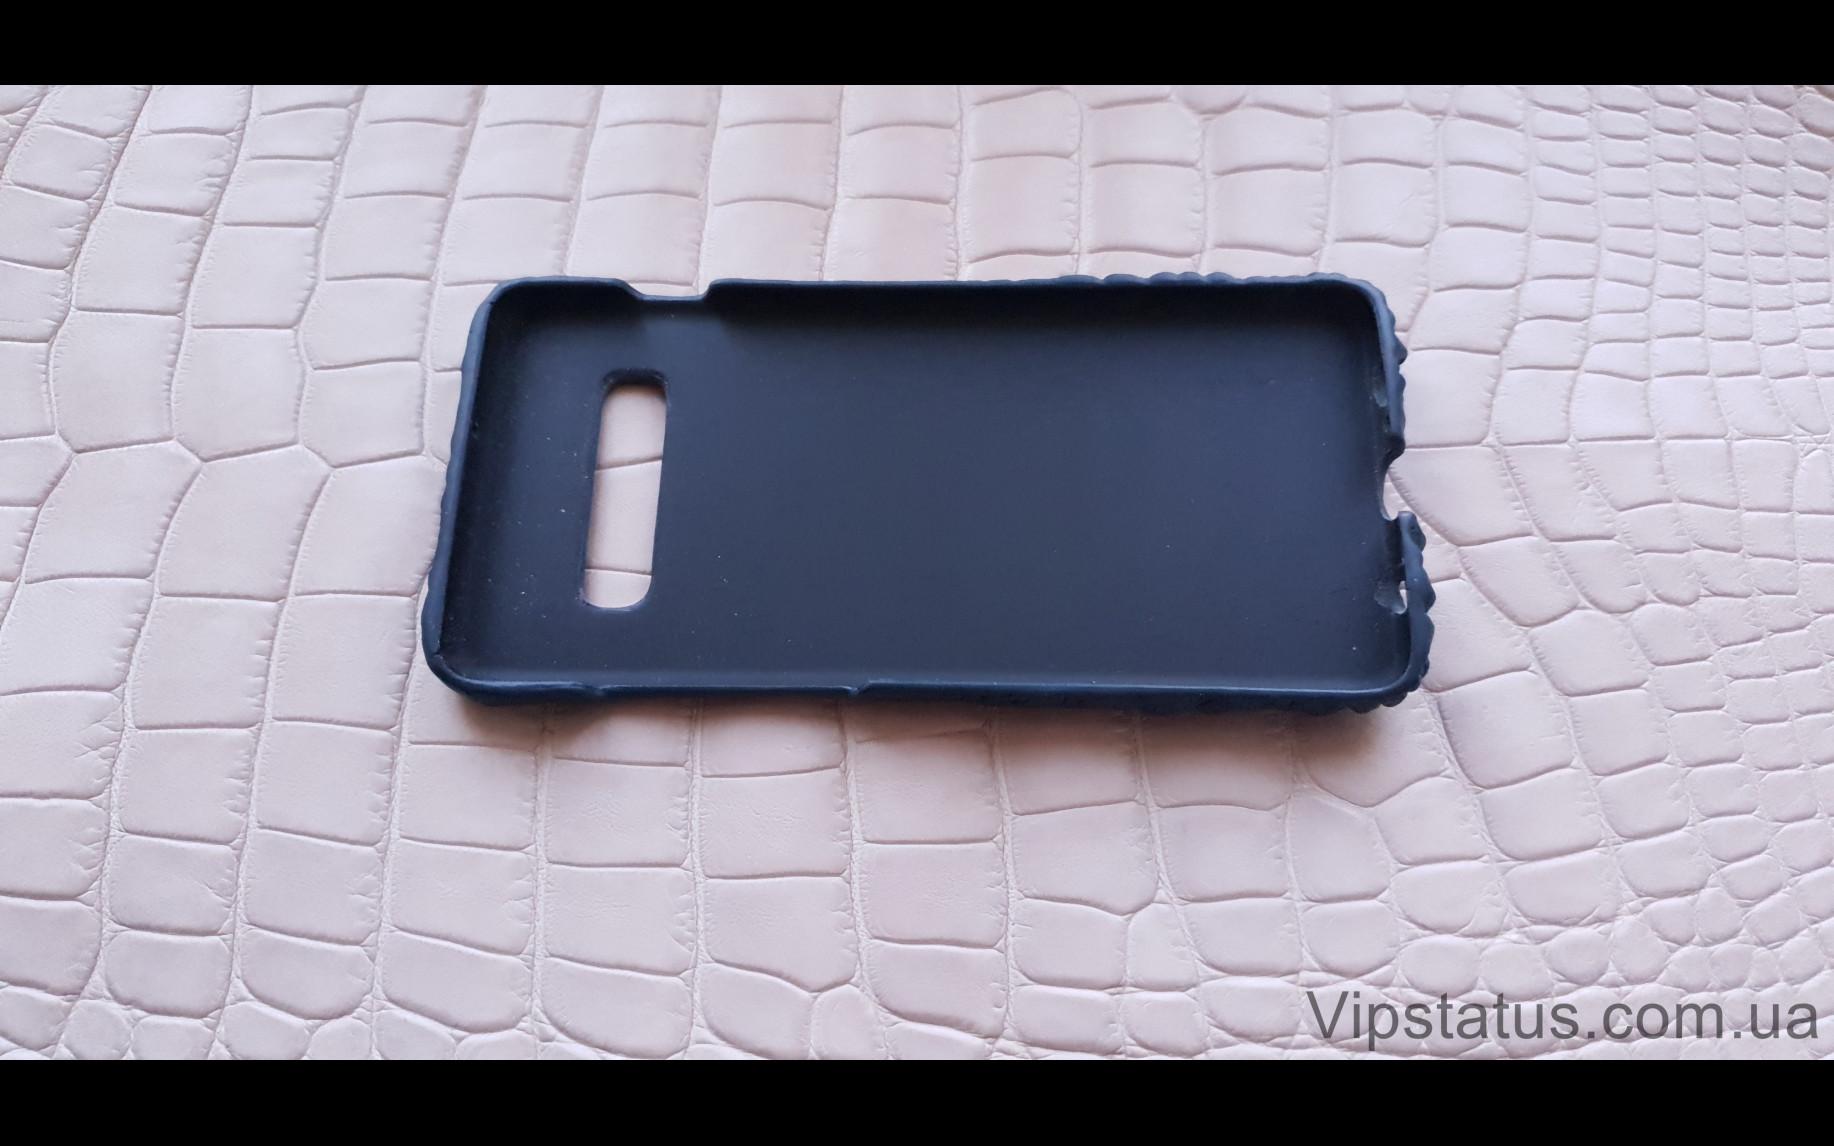 Elite Blue Crocodile Брутальный чехол Samsung S10 S20 S21 Plus Blue Crocodile Brutal case Samsung S10 S20 S21 Plus Crocodile leather image 5